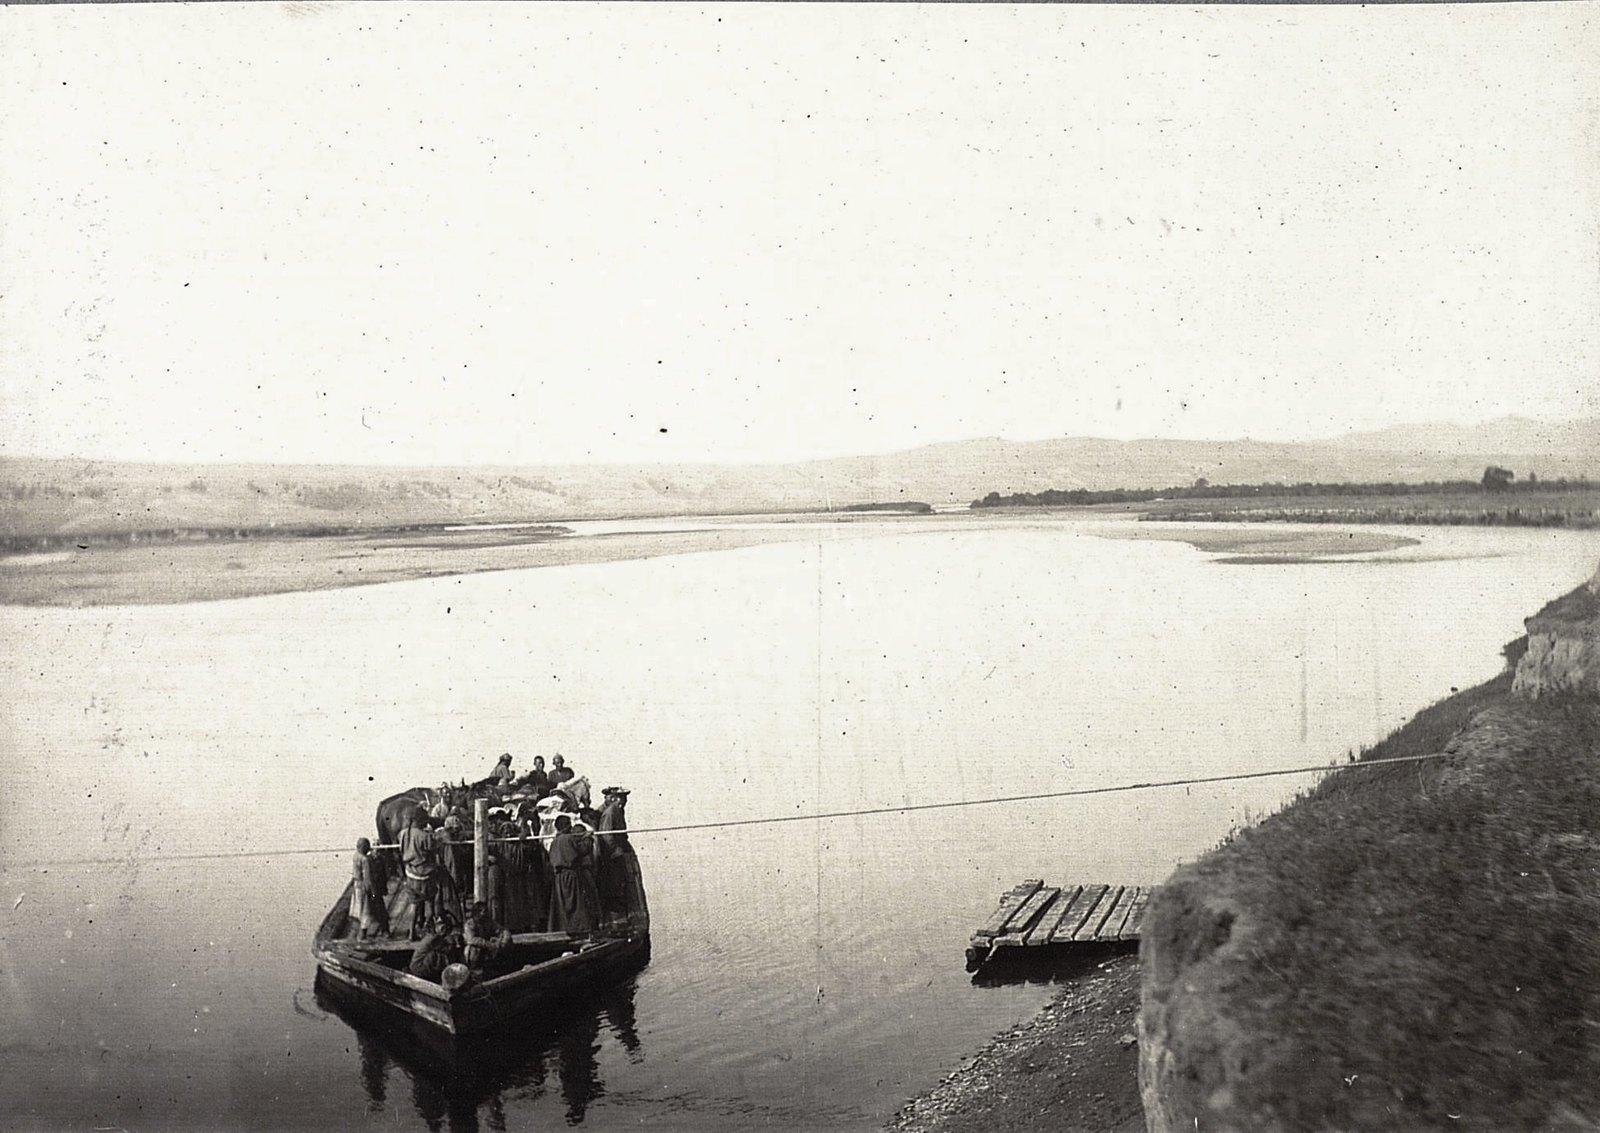 Переправа через реку Иро-Гол.